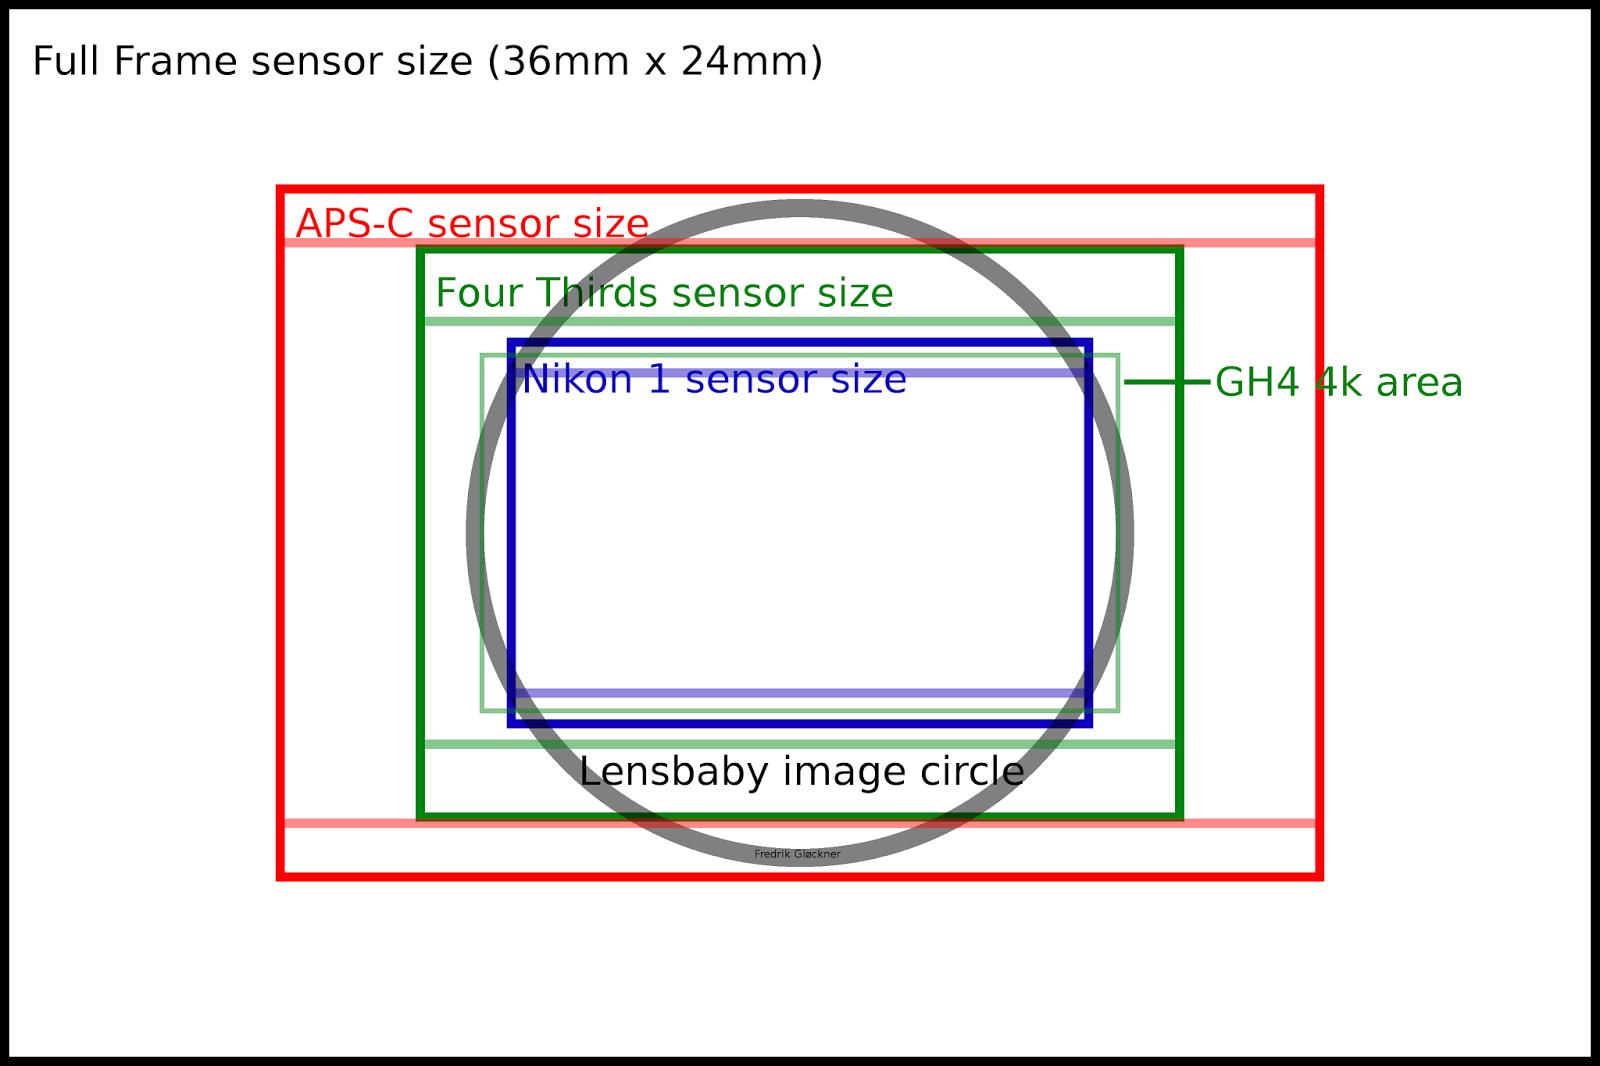 Micro 4/3rds Photography: Lensbaby 5.8mm f/3.5 circular fisheye